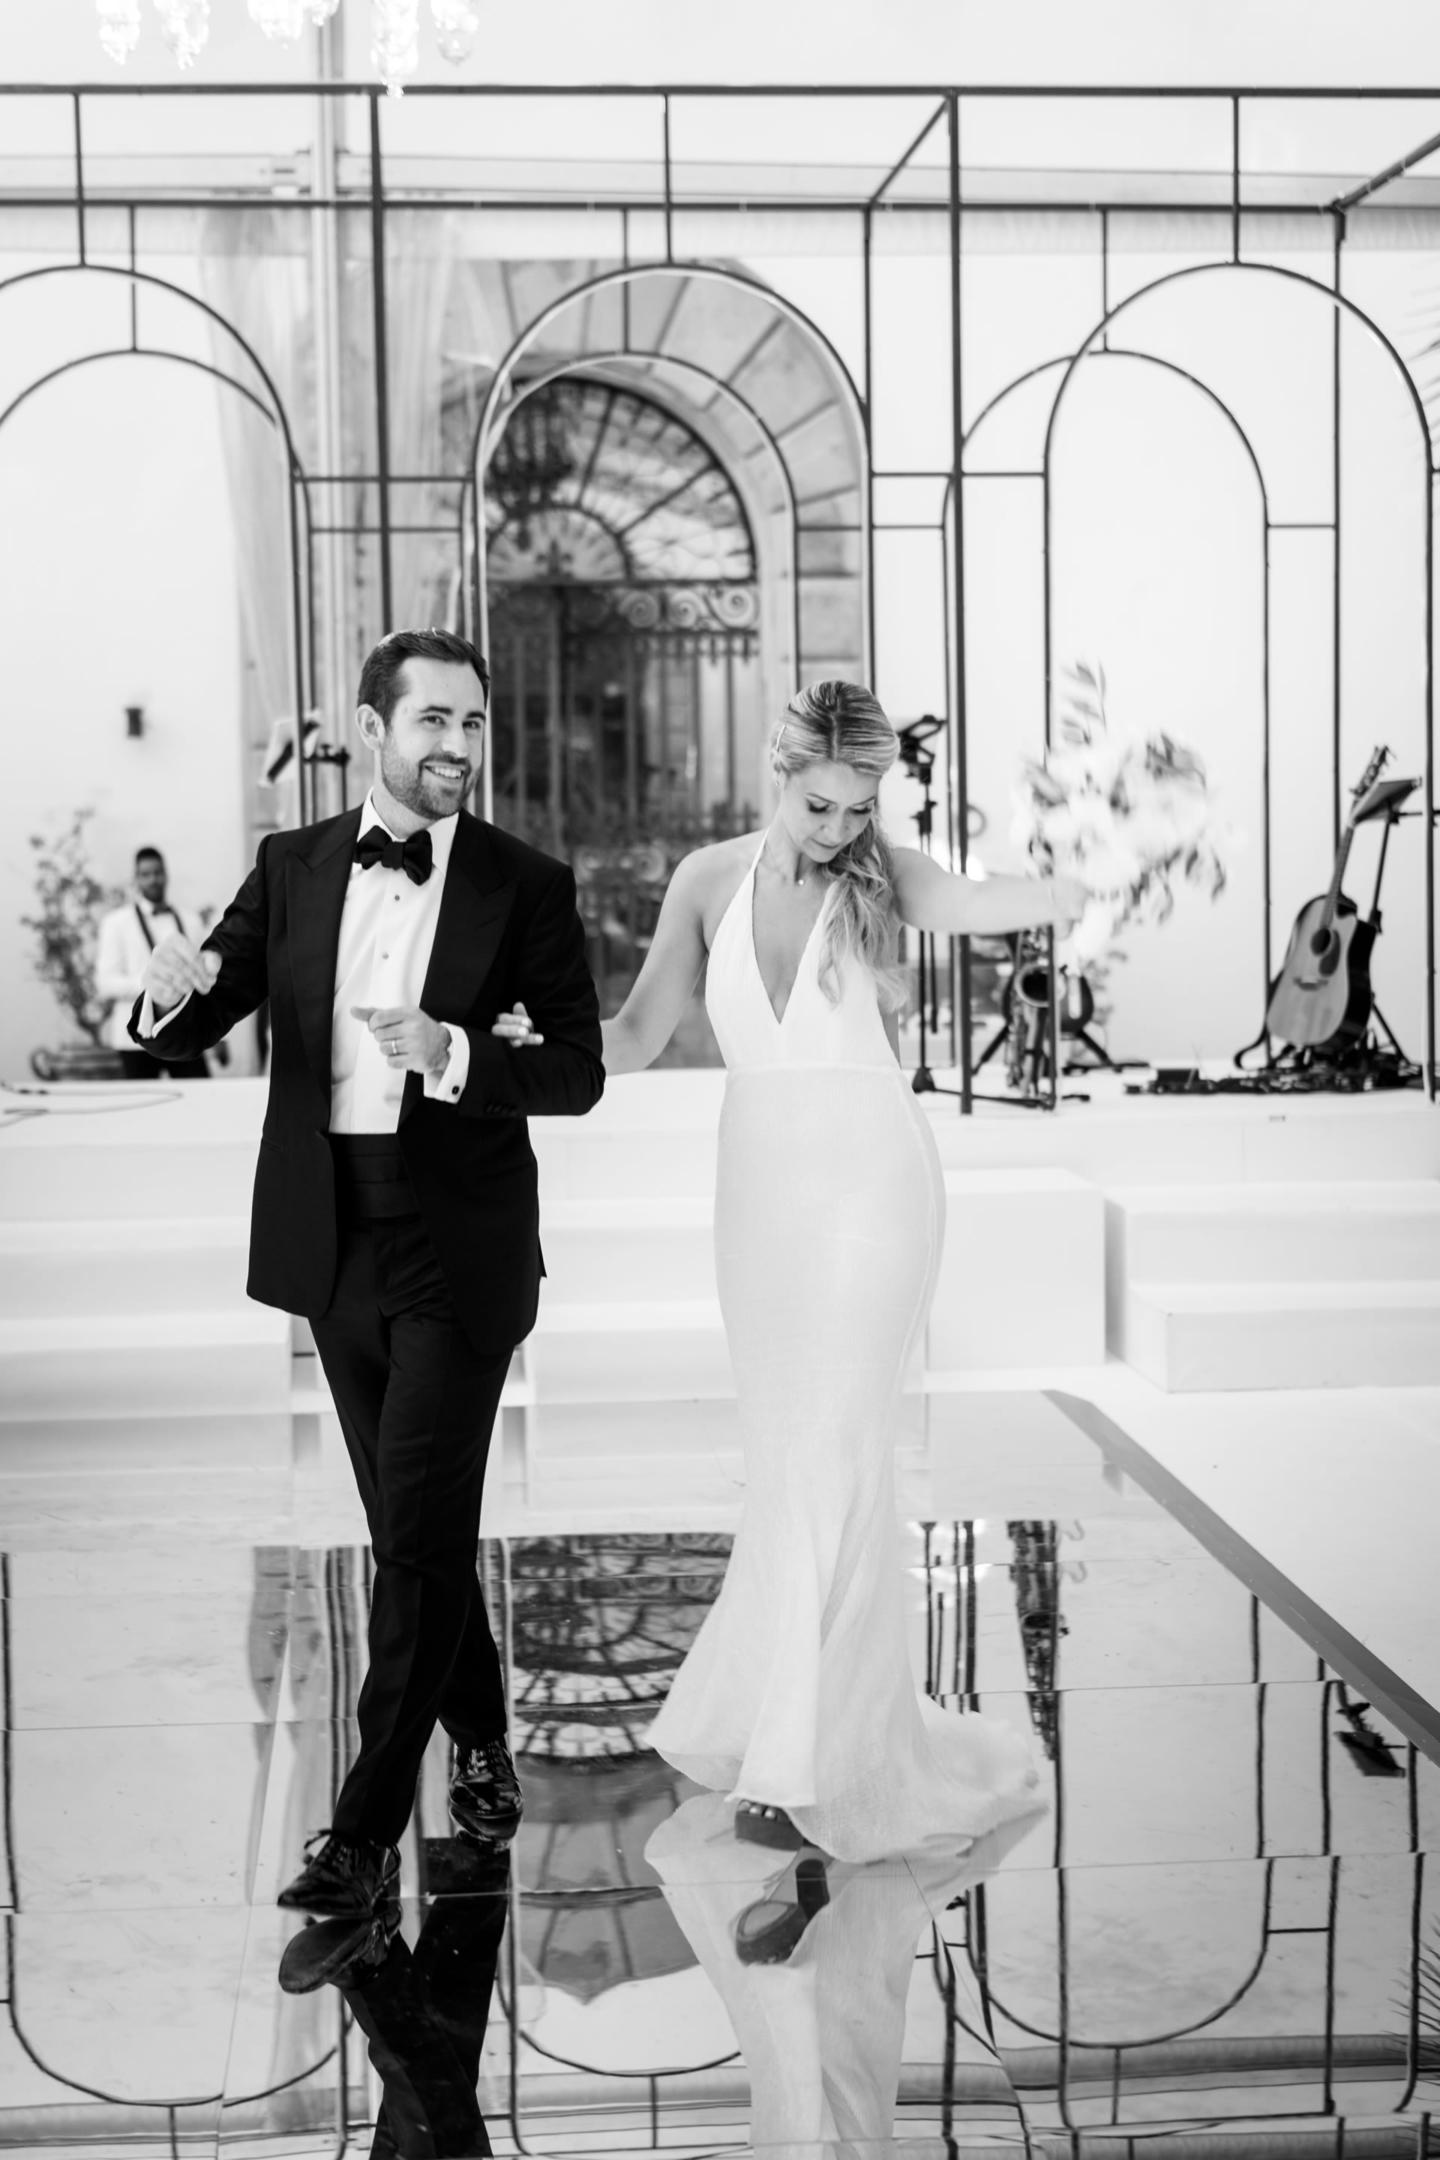 A sparkling wedding in the shore of the Arno - 80 :: A sparkling wedding on the shore of the Arno :: Luxury wedding photography - 79 :: A sparkling wedding in the shore of the Arno - 80